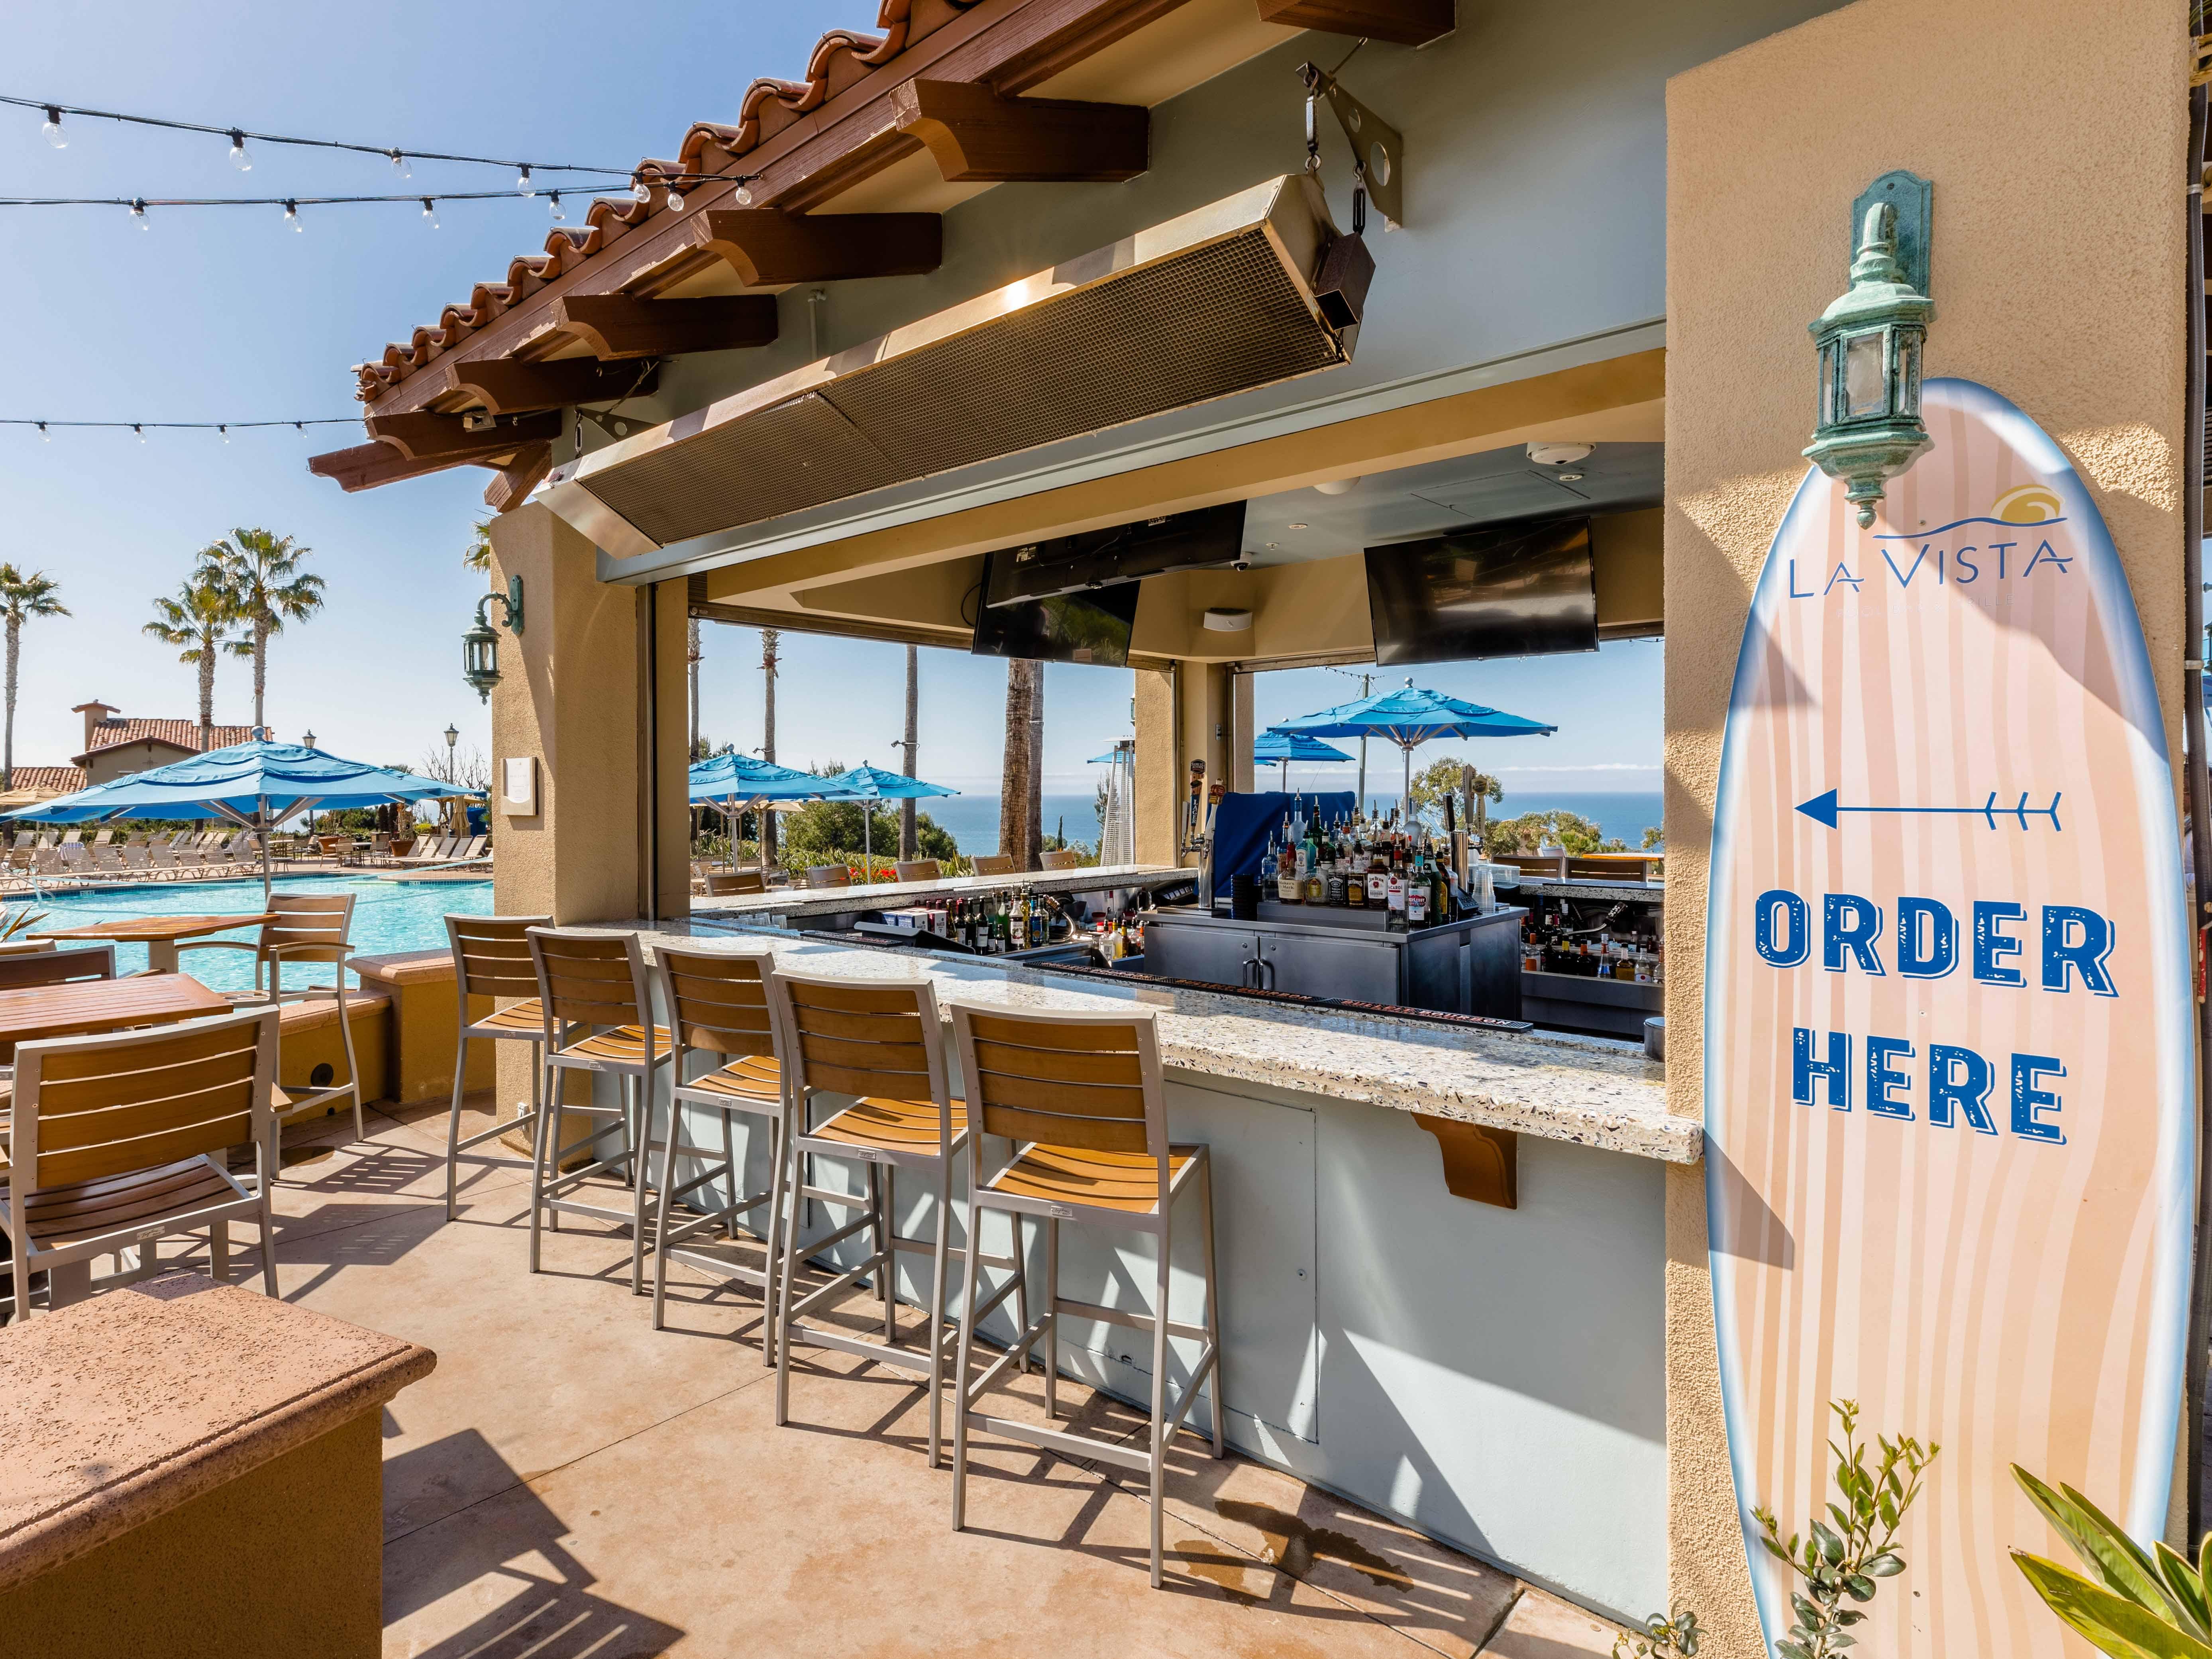 Marriott's Newport Coast<span class='trademark'>®</span> Villas La Vista Poolside Bar & Grill. Marriott's Newport Coast<span class='trademark'>®</span> Villas is located in Newport Coast, California United States.